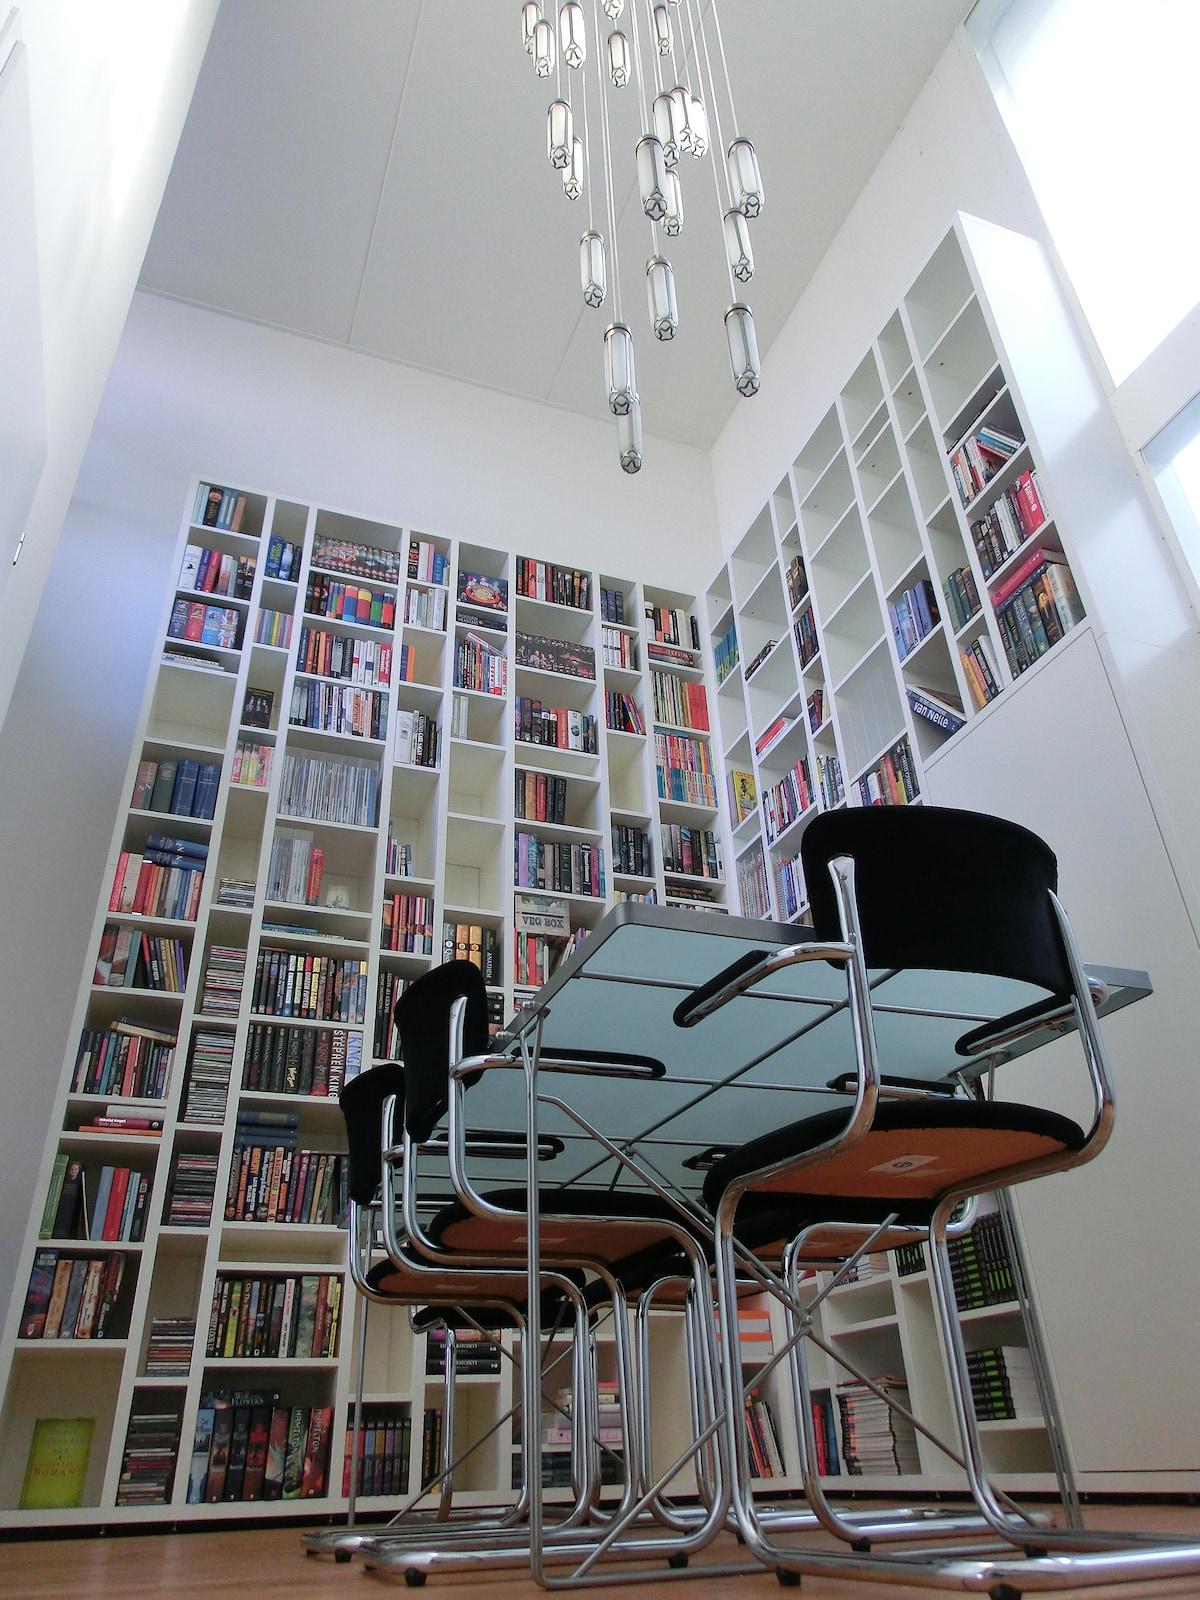 Entry hallway, 6 meters high, with 4-meters book case